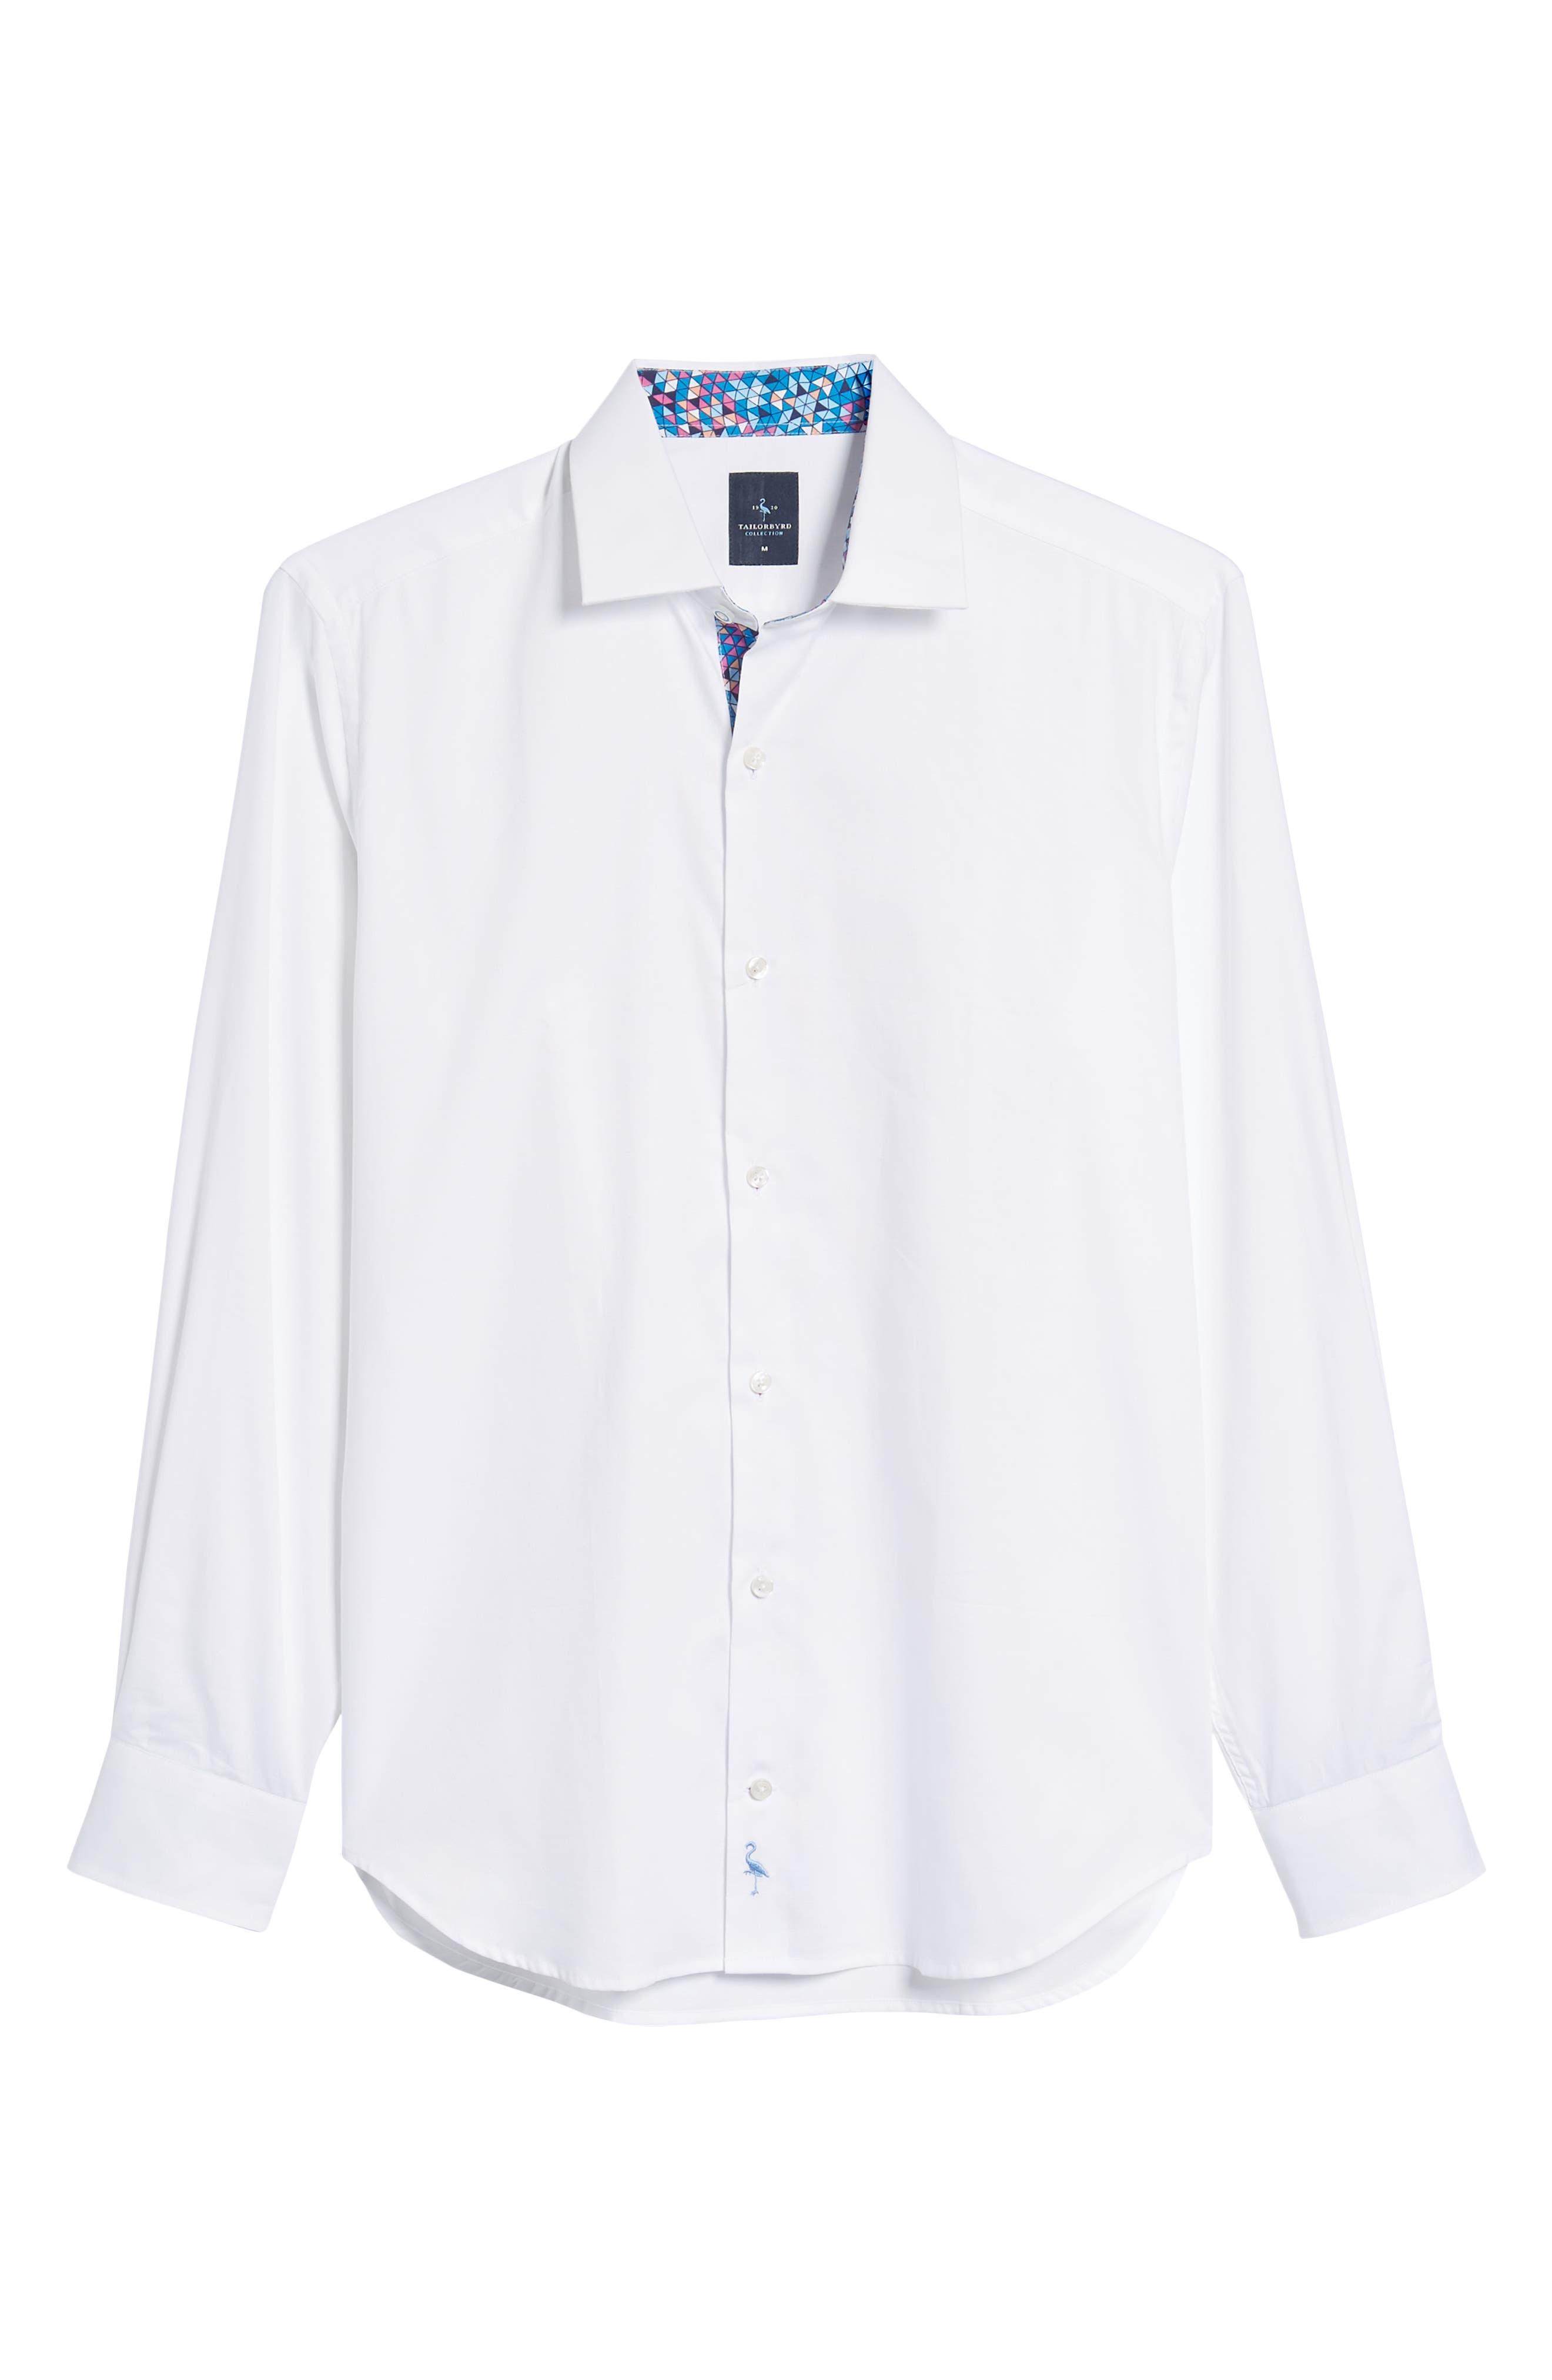 Baxley Regular Fit Sport Shirt,                             Alternate thumbnail 6, color,